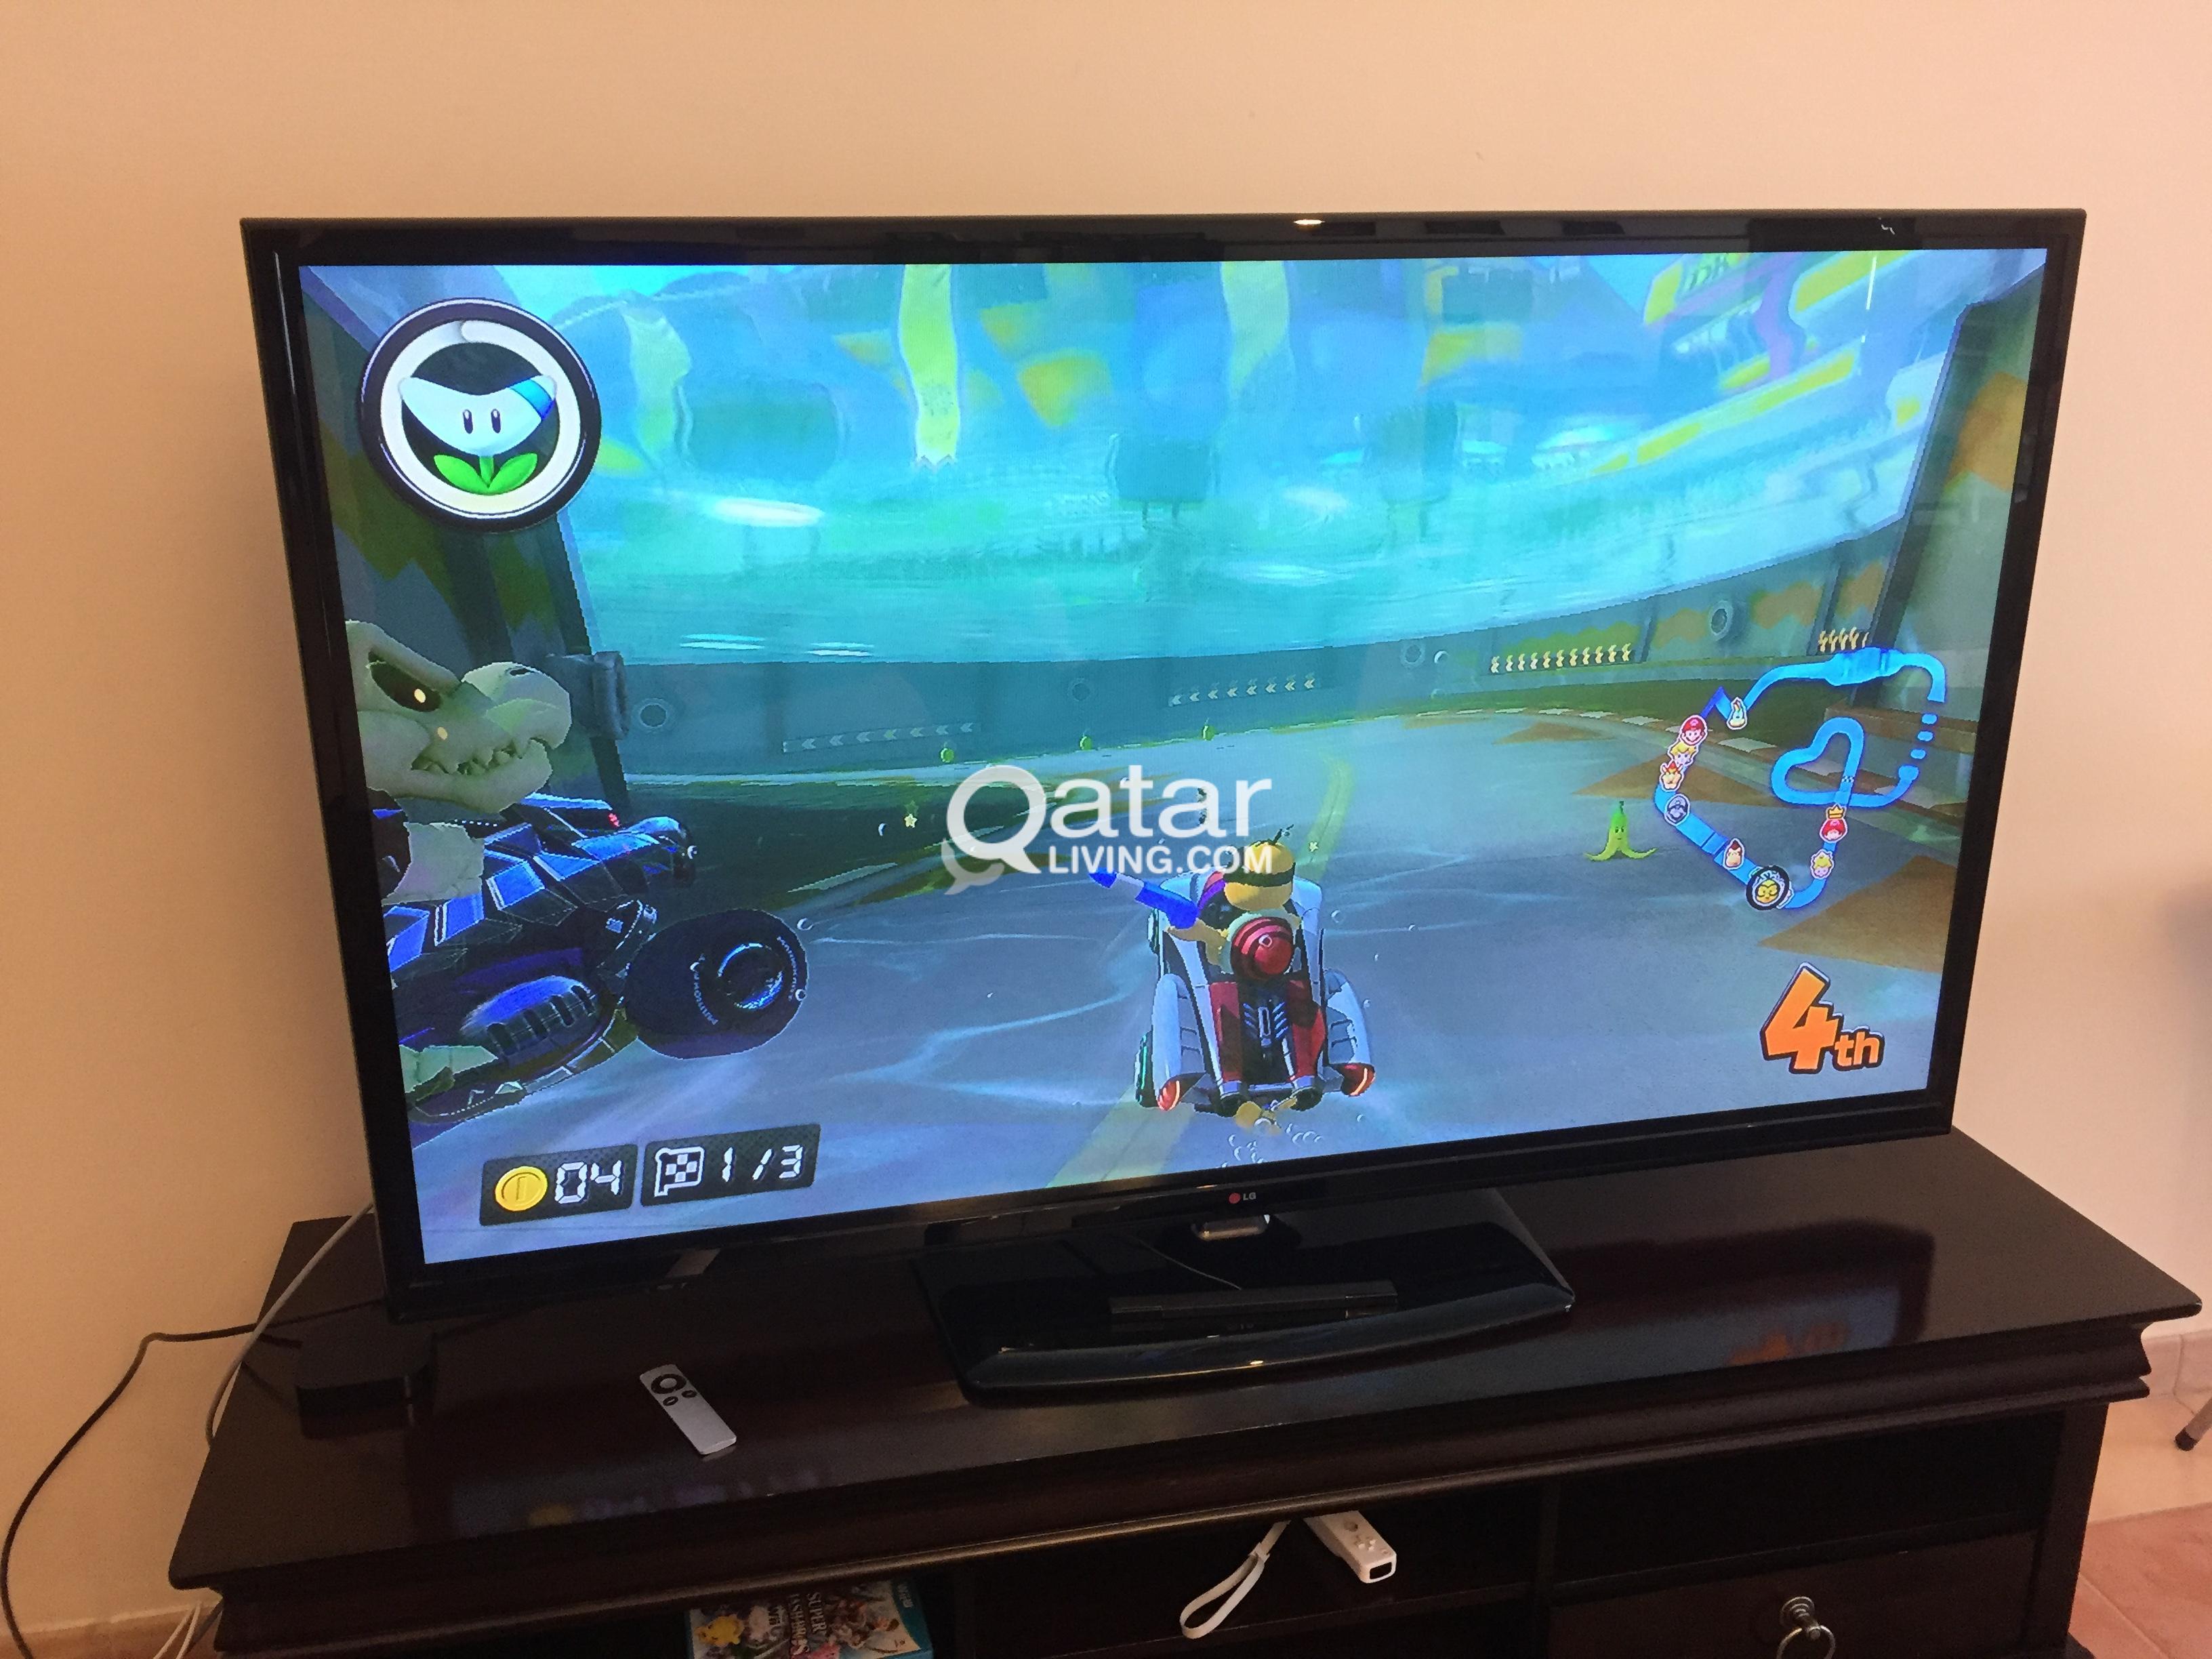 title; title LG 60 inch Plasma HD flat screen TV | Qatar Living